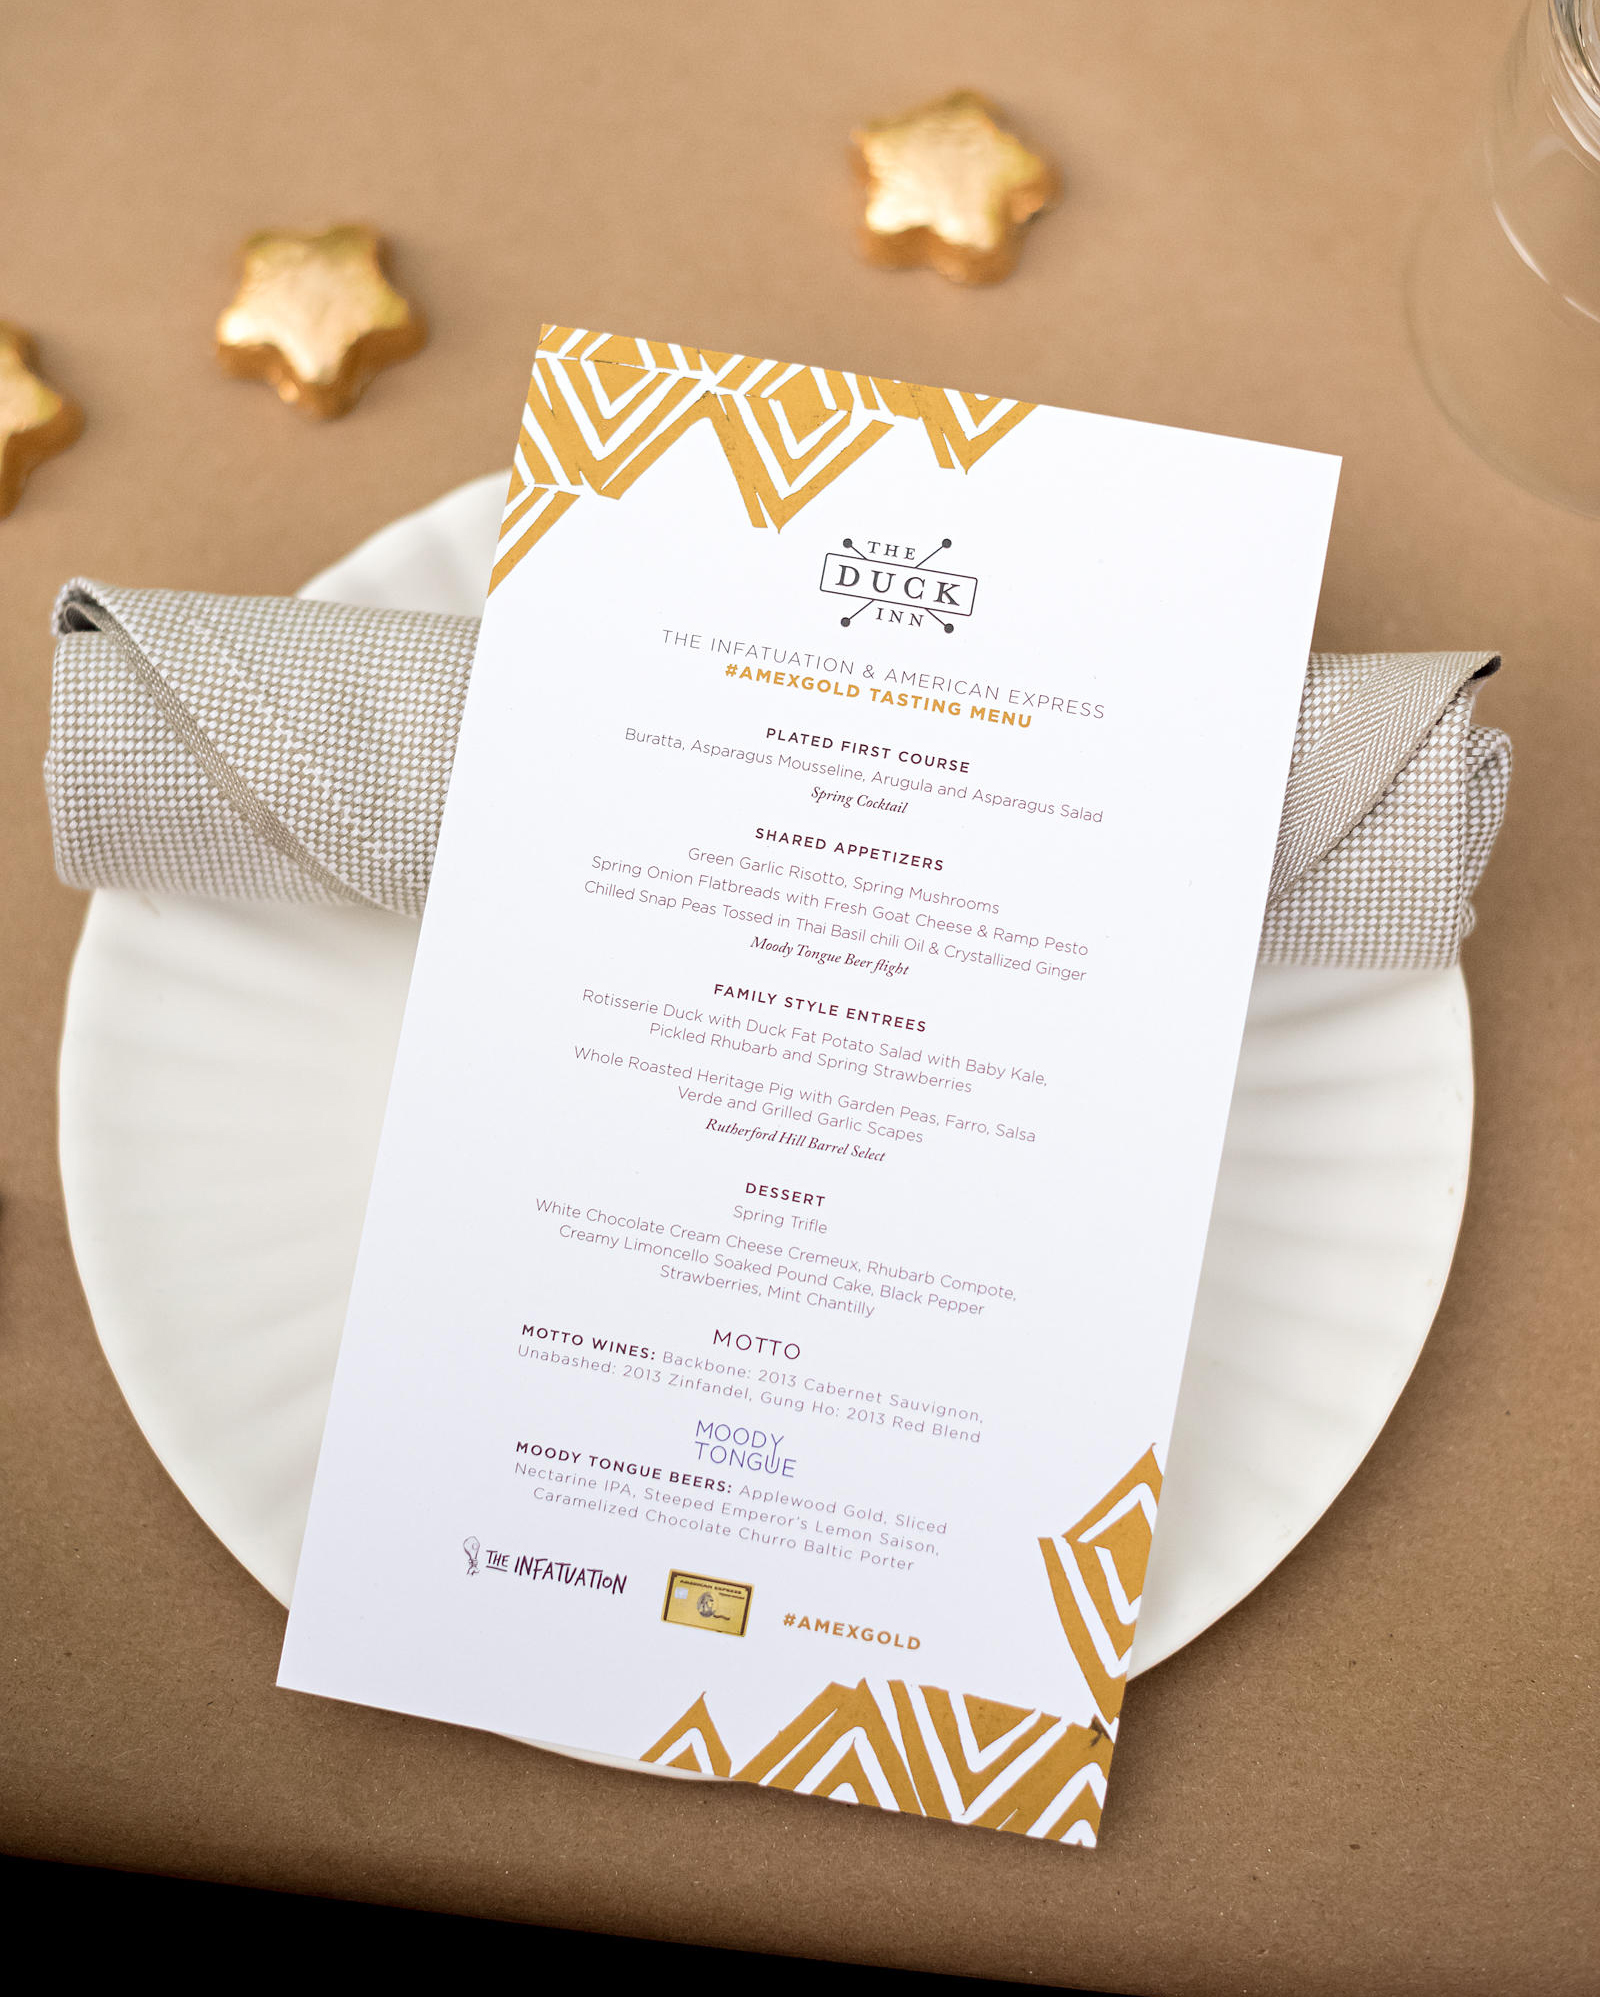 AMEX-Infatuation-Dinner-menus-2016-3.jpg